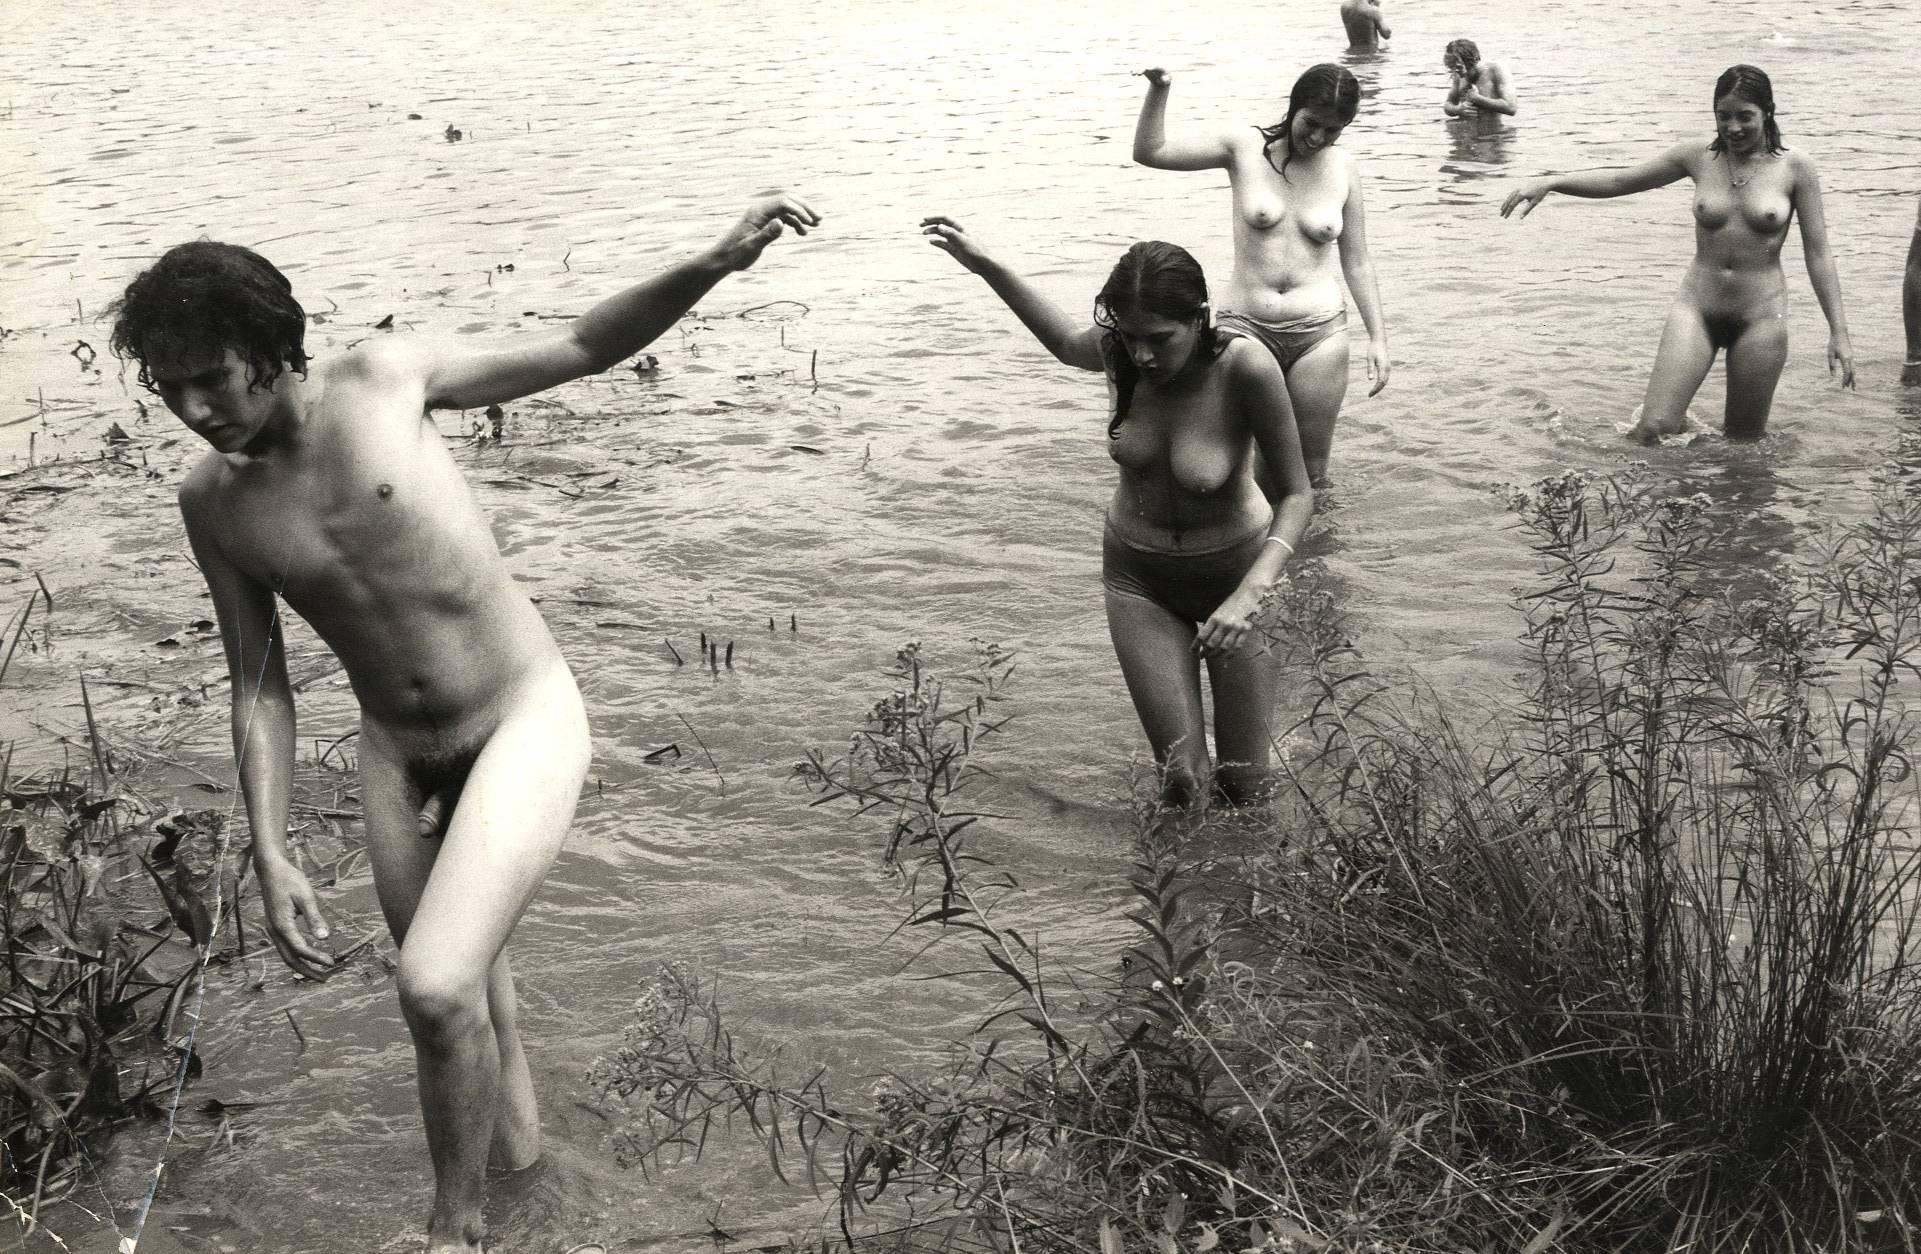 Woodstock uncensored nudes #12